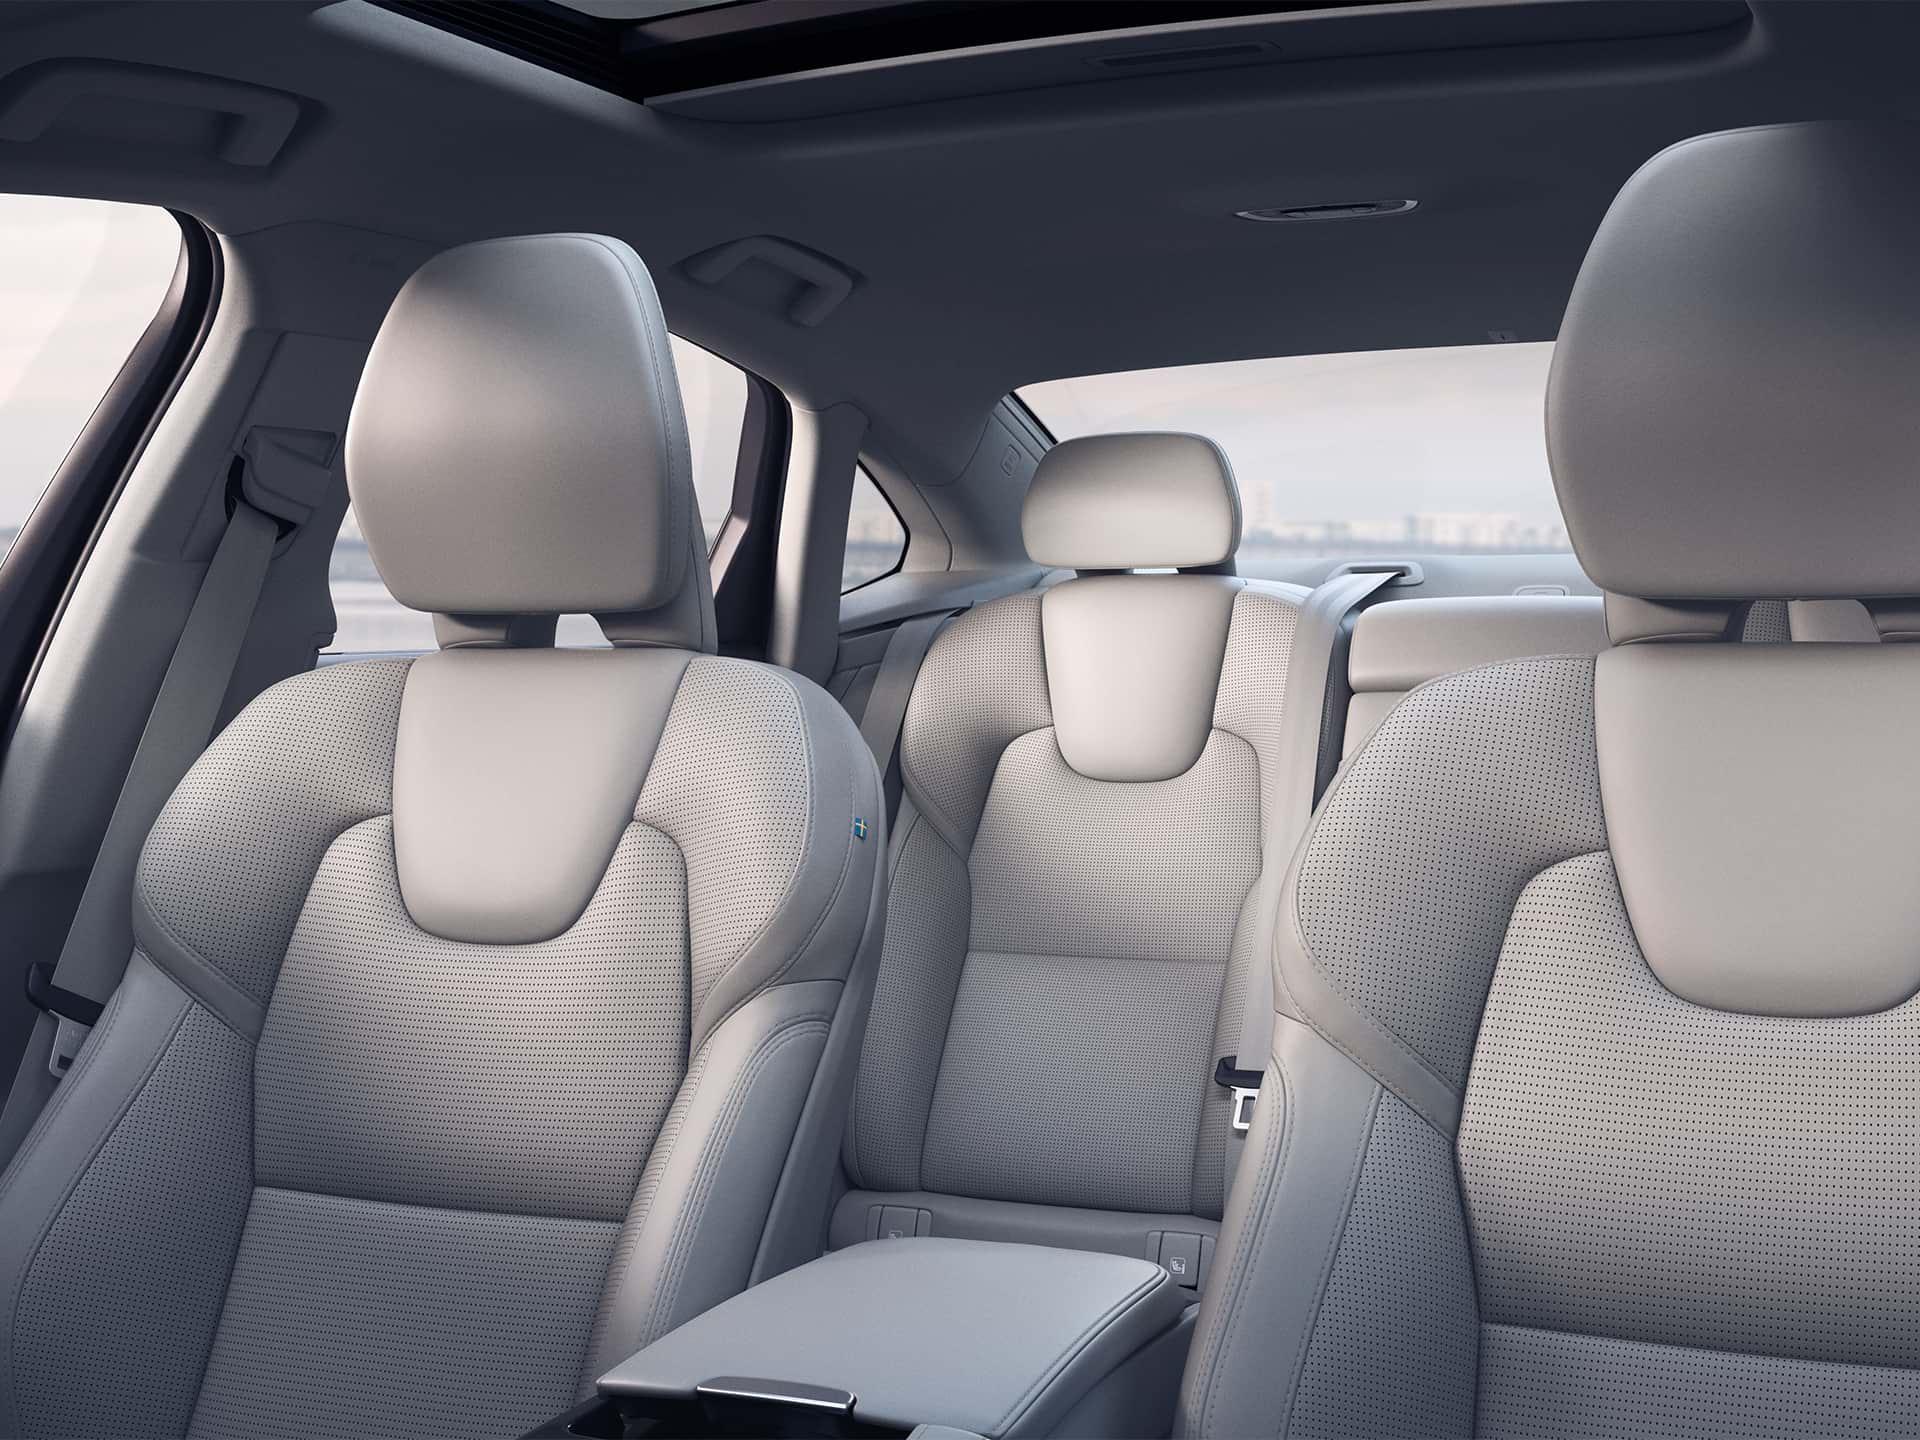 Inside a Volvo Sedan, beige blond interior